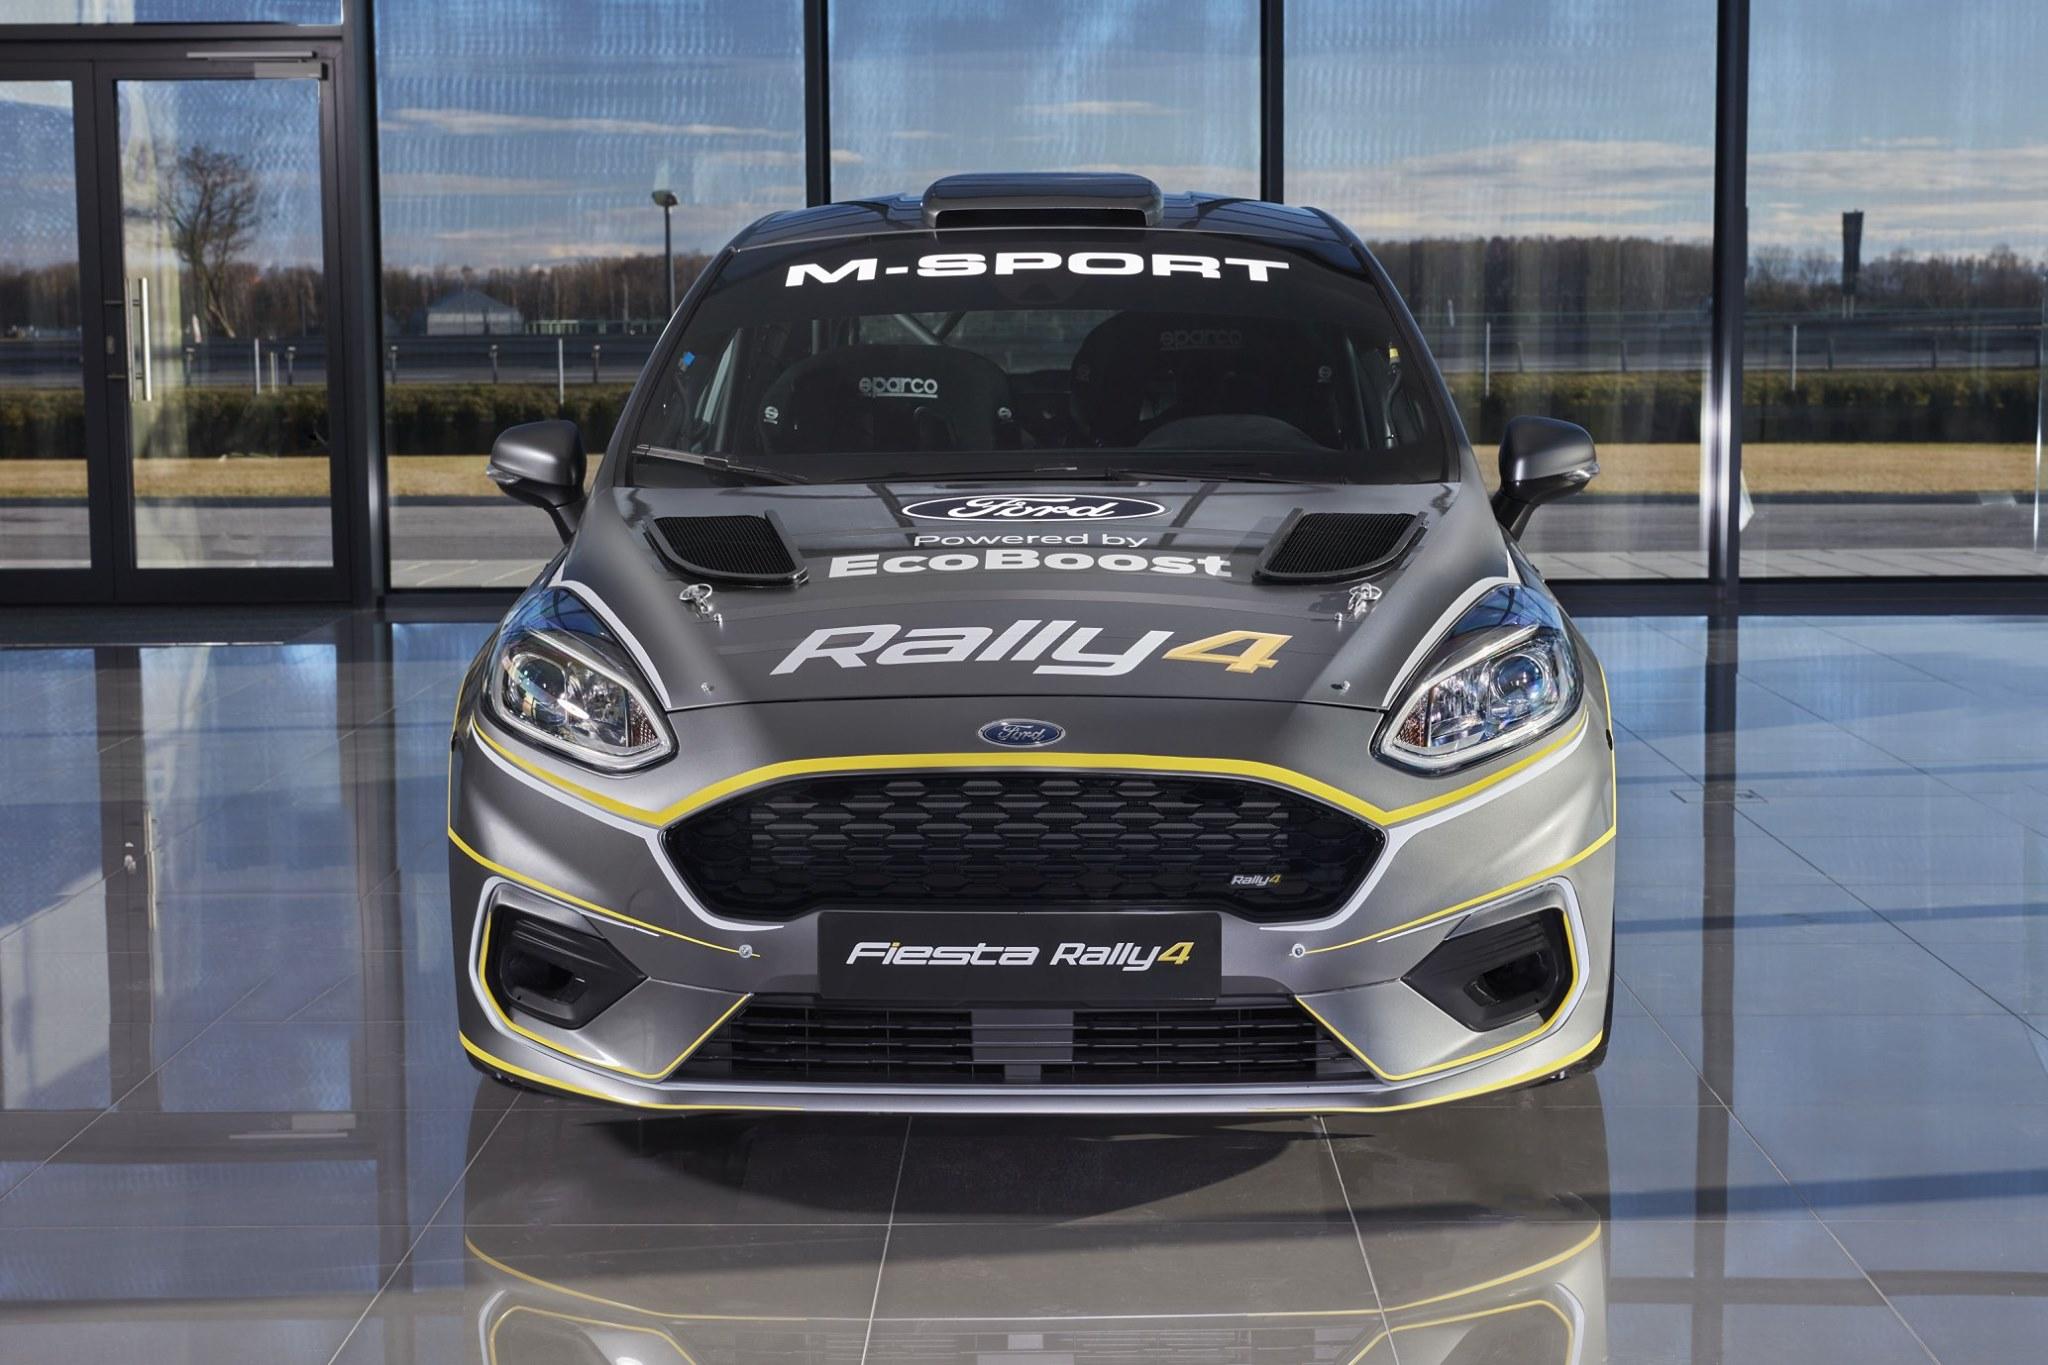 Ford_Fiesta_Rally4_0001